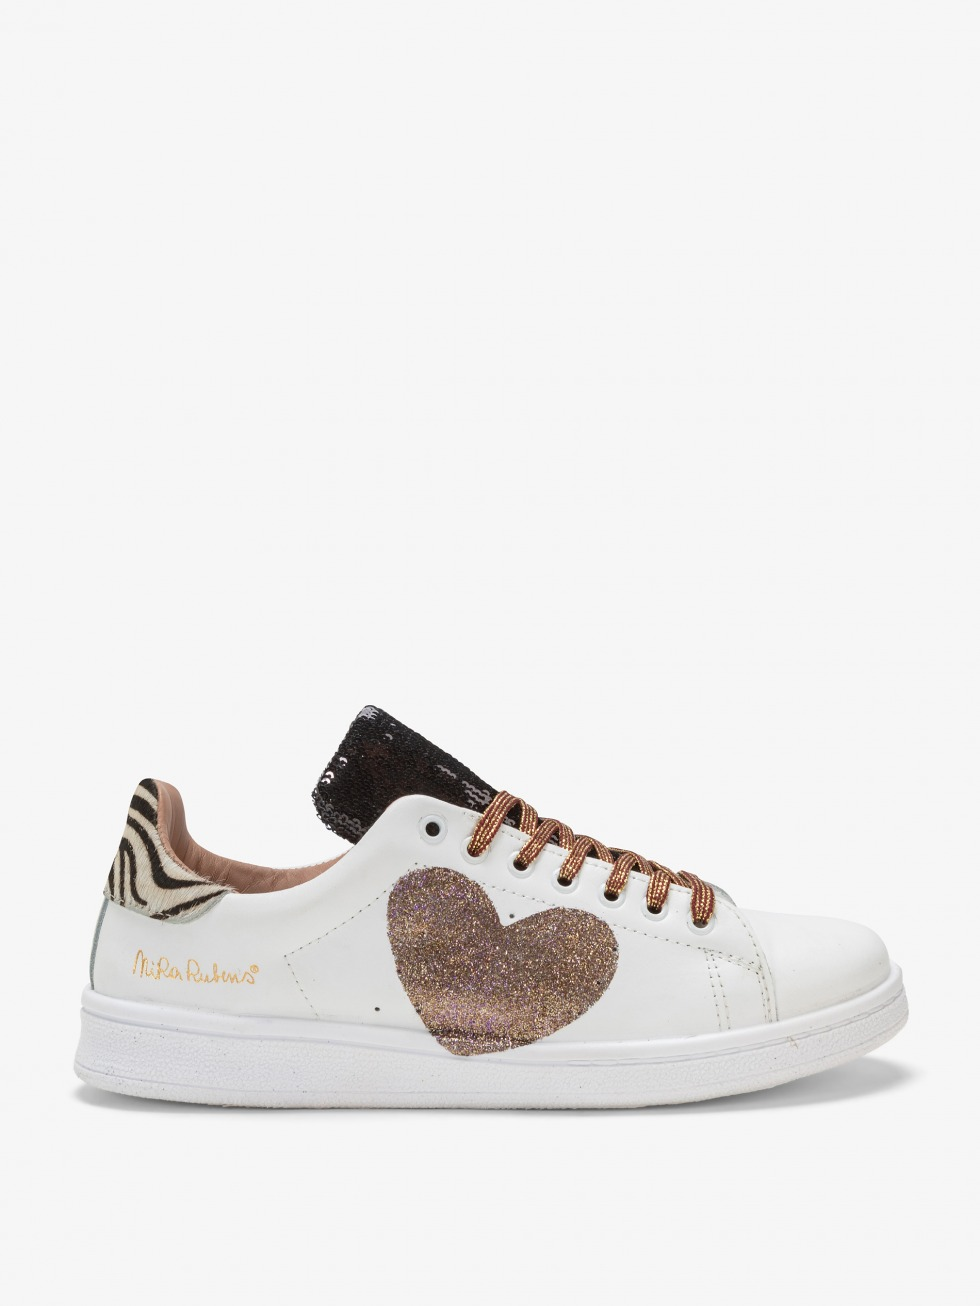 Daiquiri Black & White Sneakers - Bronze Heart